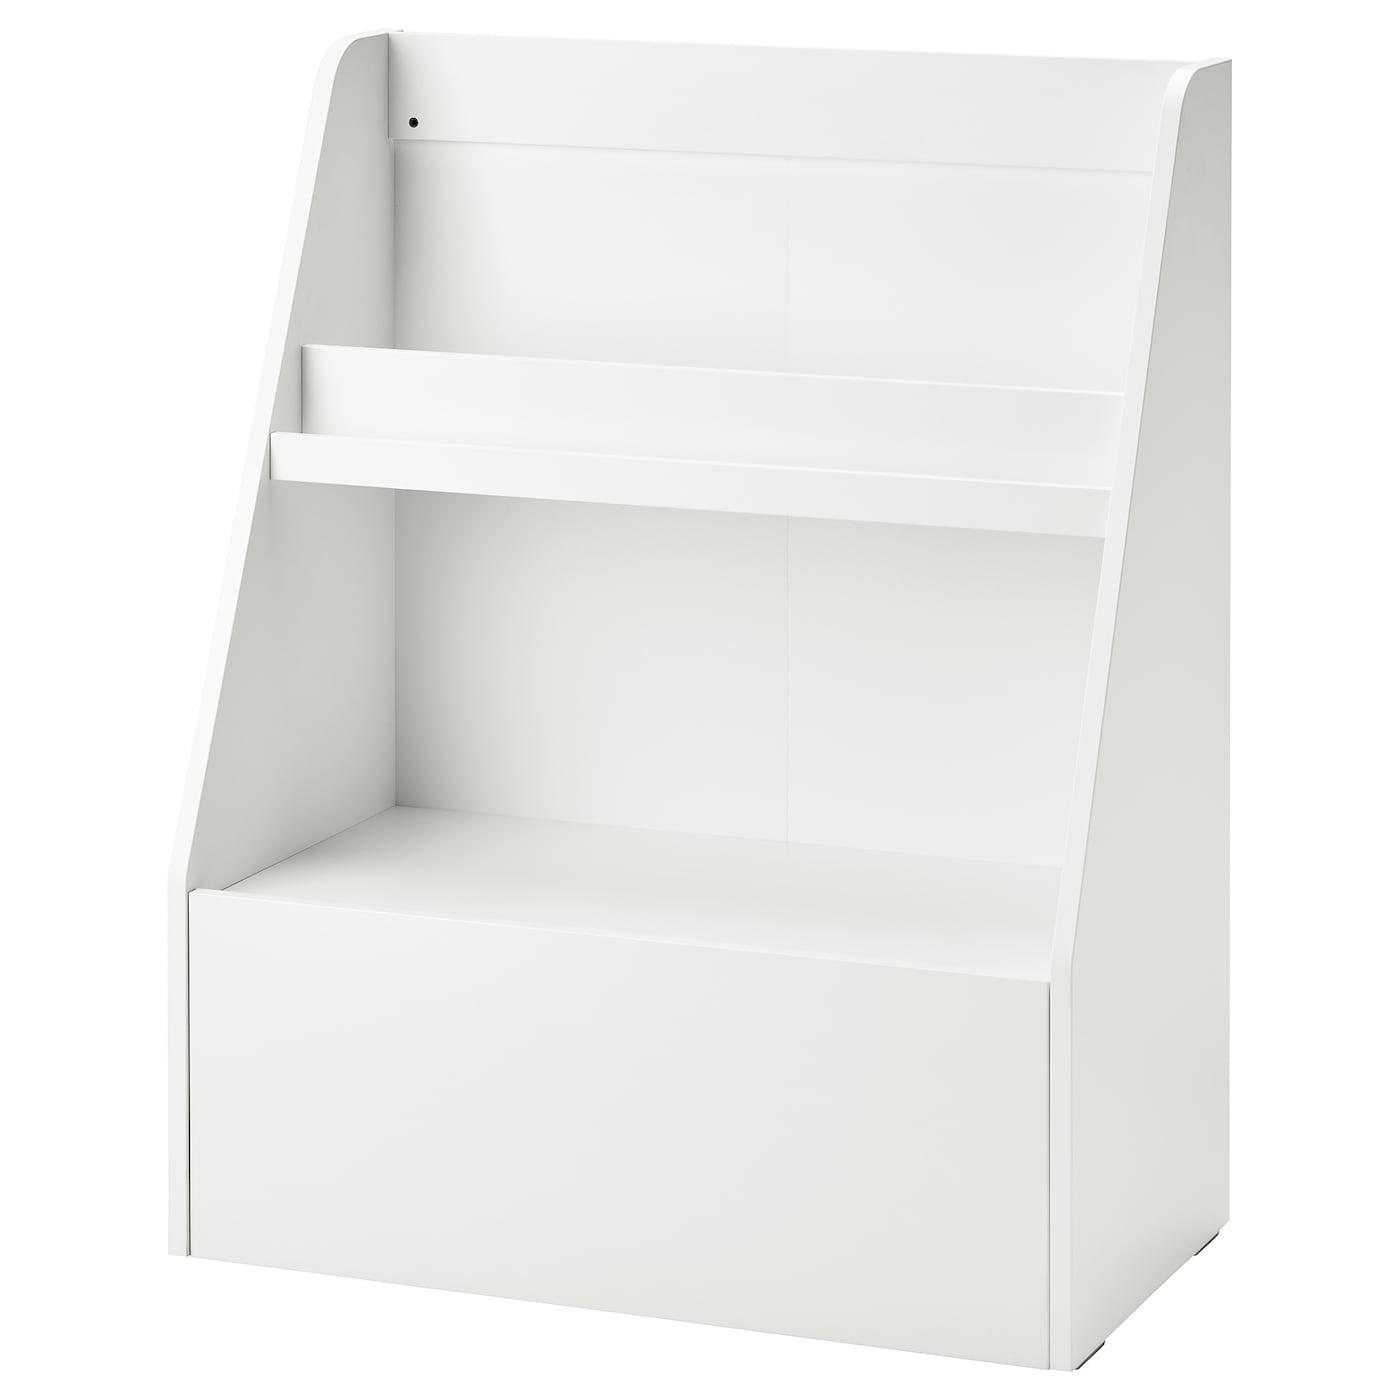 BERGIG Présentoir livres av rgmt, blanc - IKEA